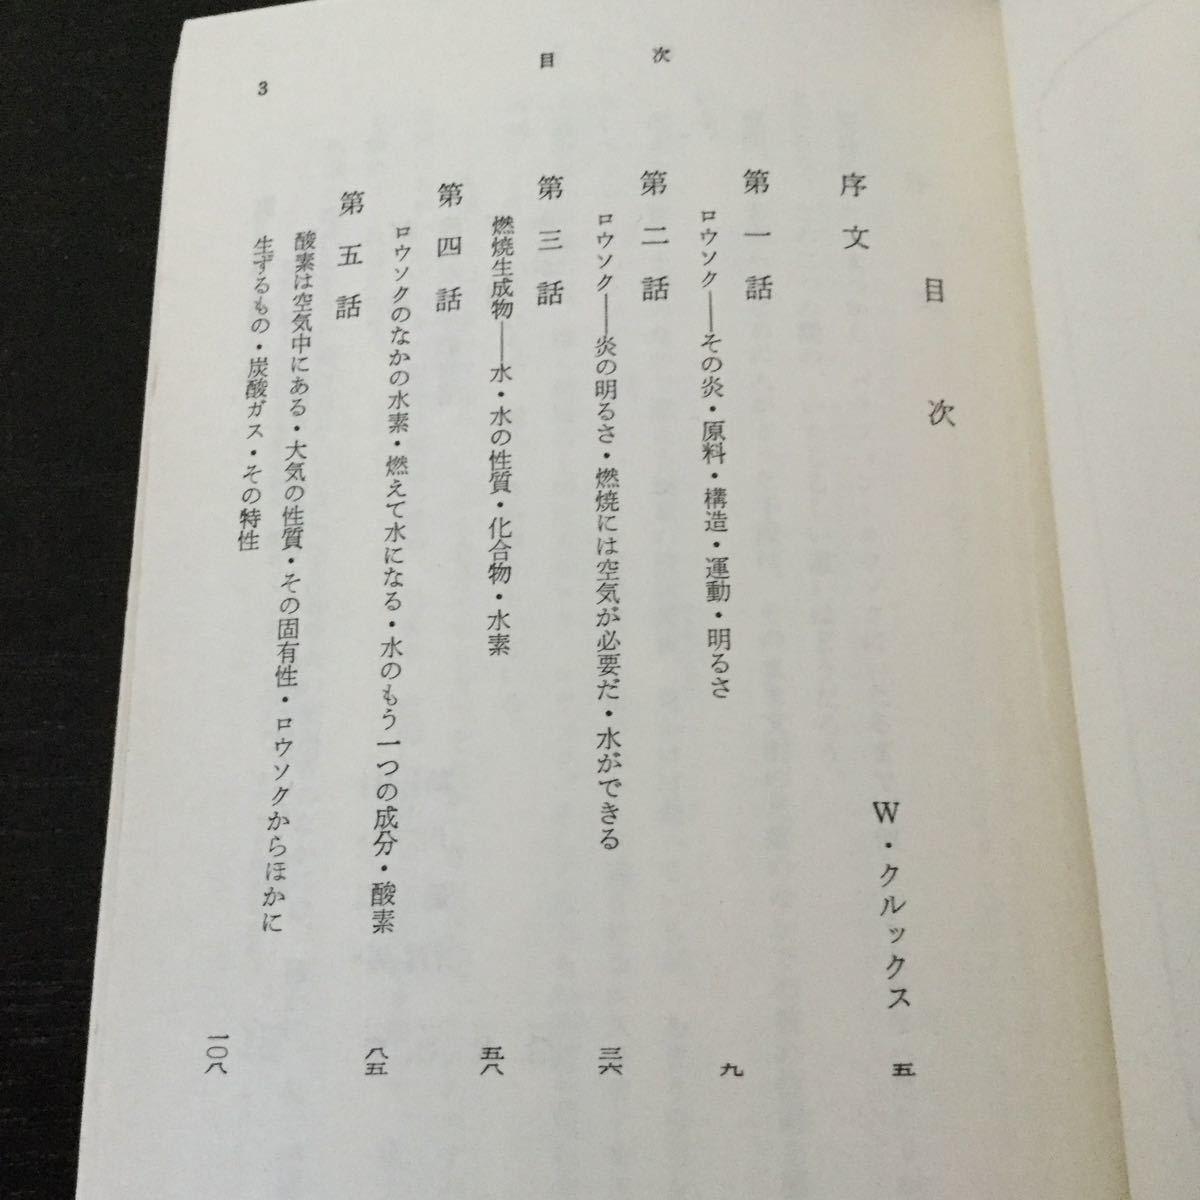 a37 ロウソクの科学 ファラデー 日下実男 小説 旺文社文庫 旺文社 _画像4